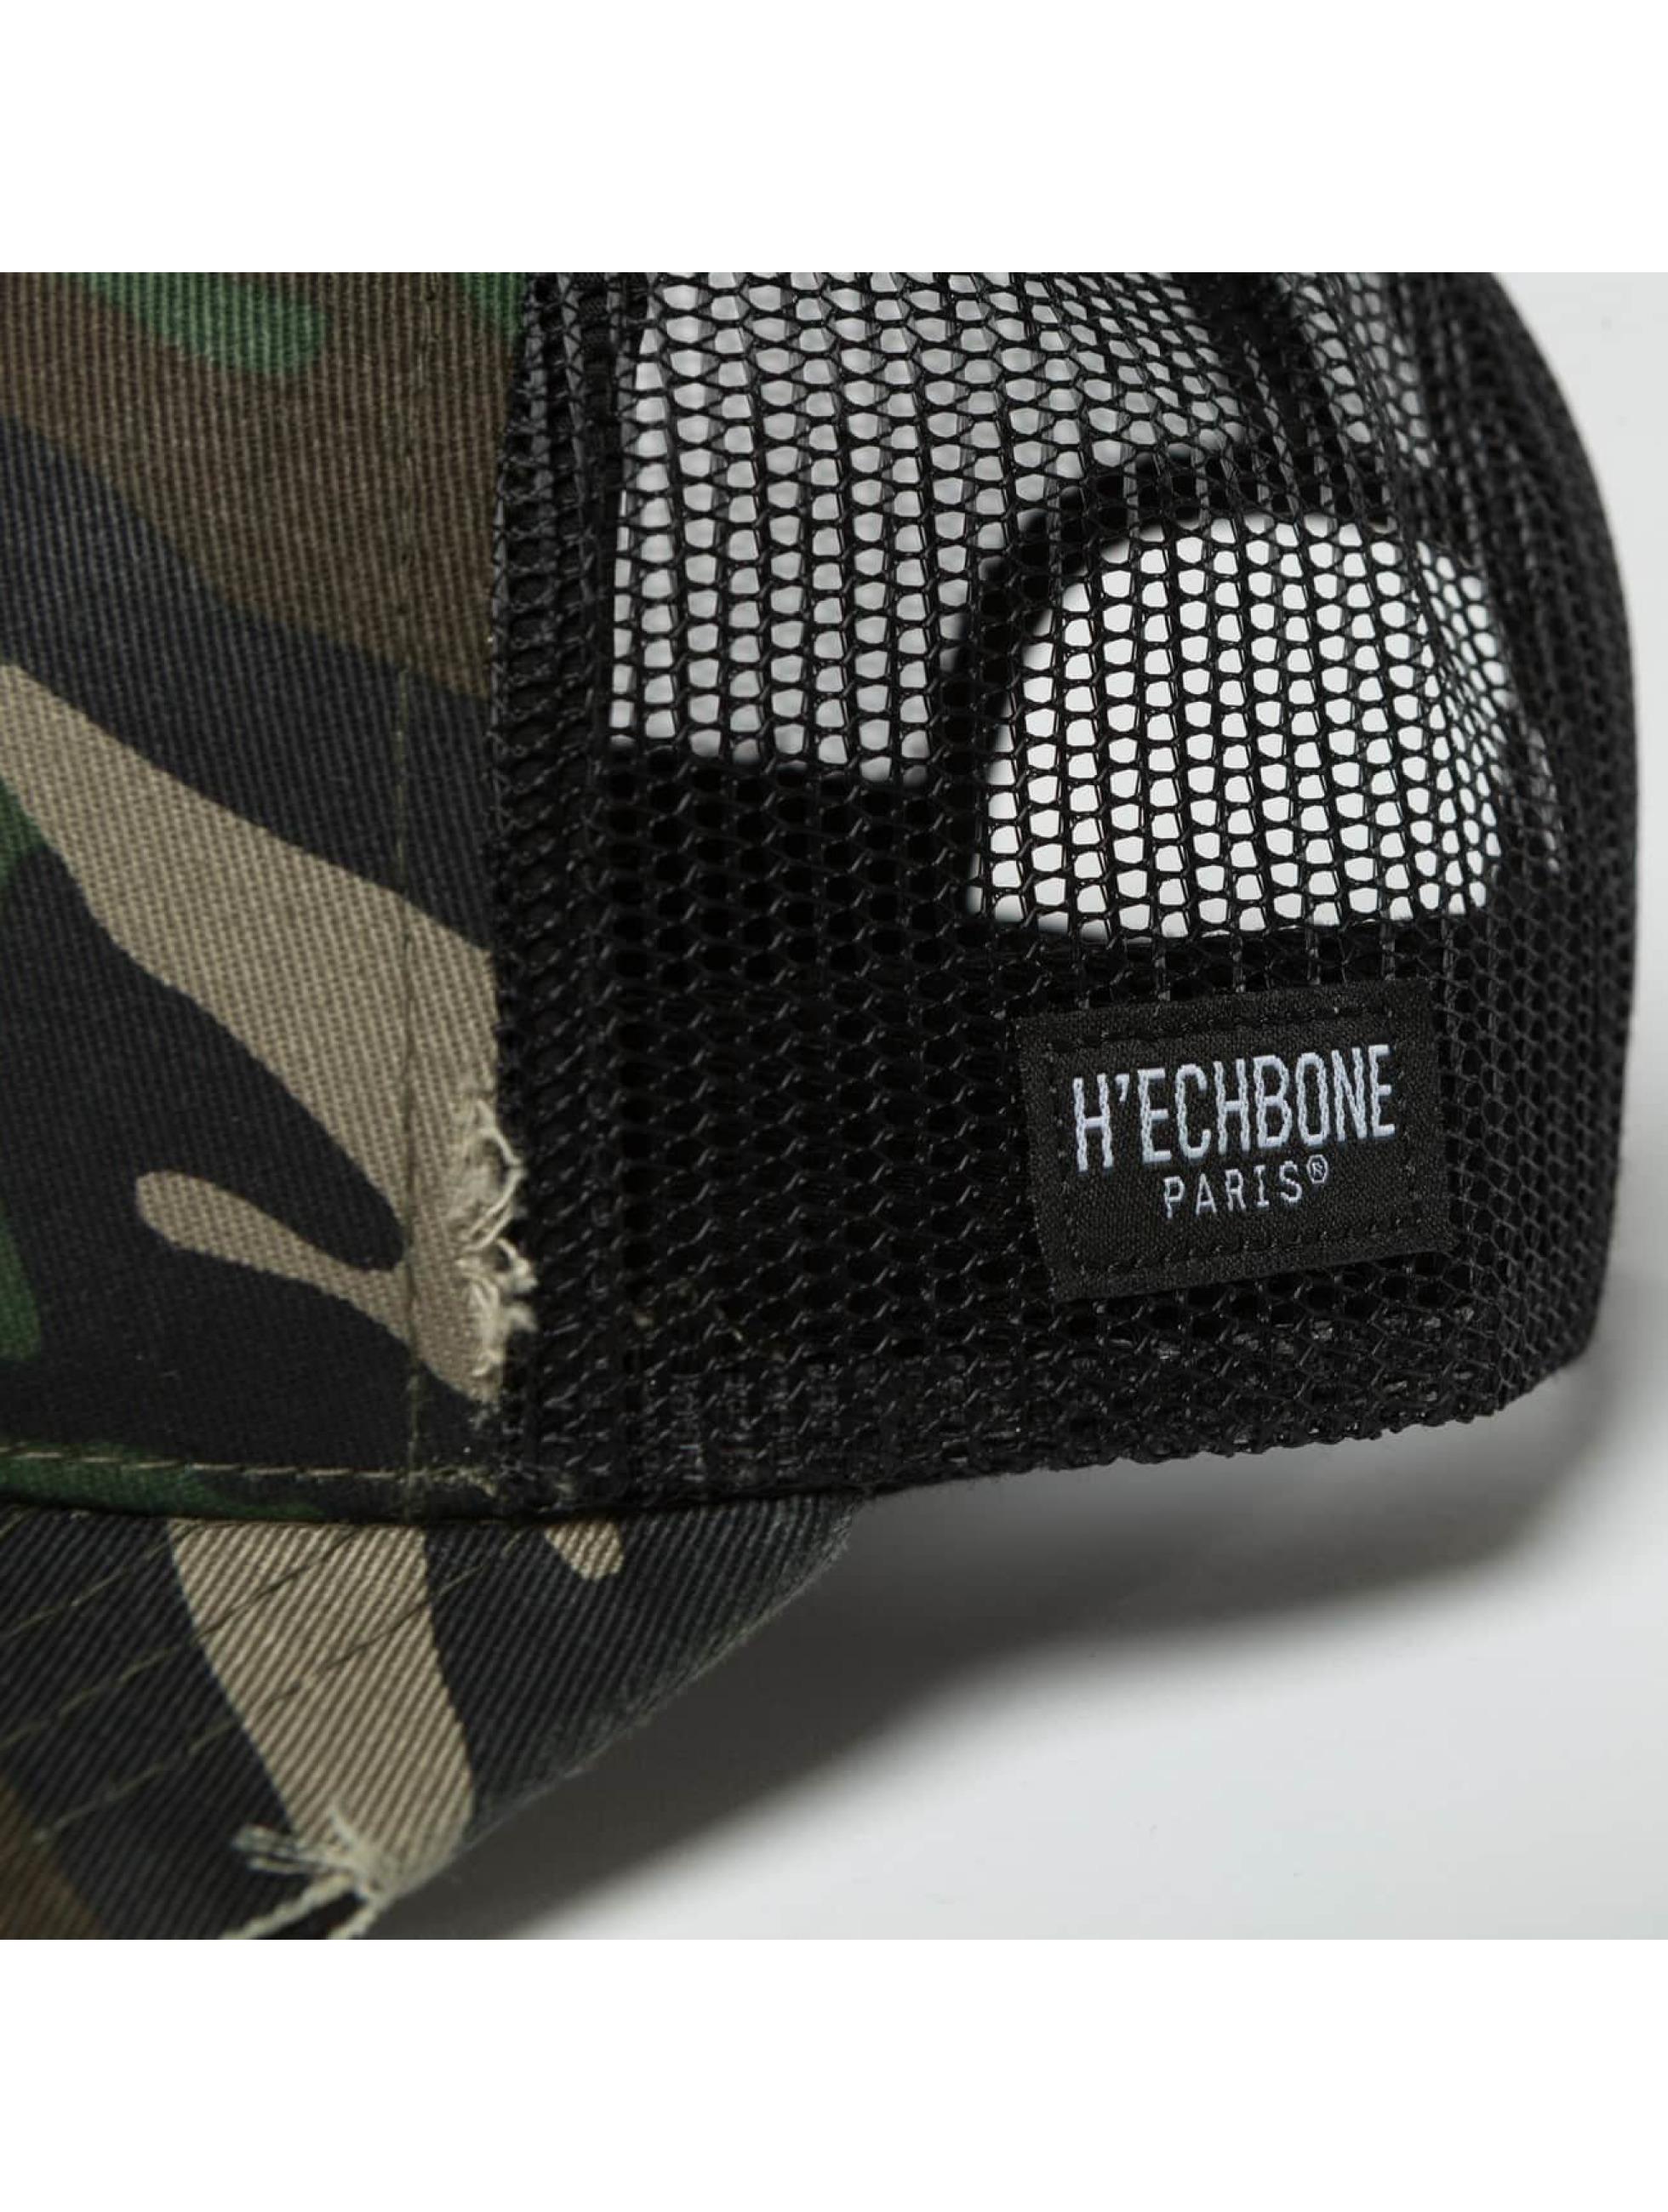 Hechbone Casquette Trucker mesh Rose camouflage